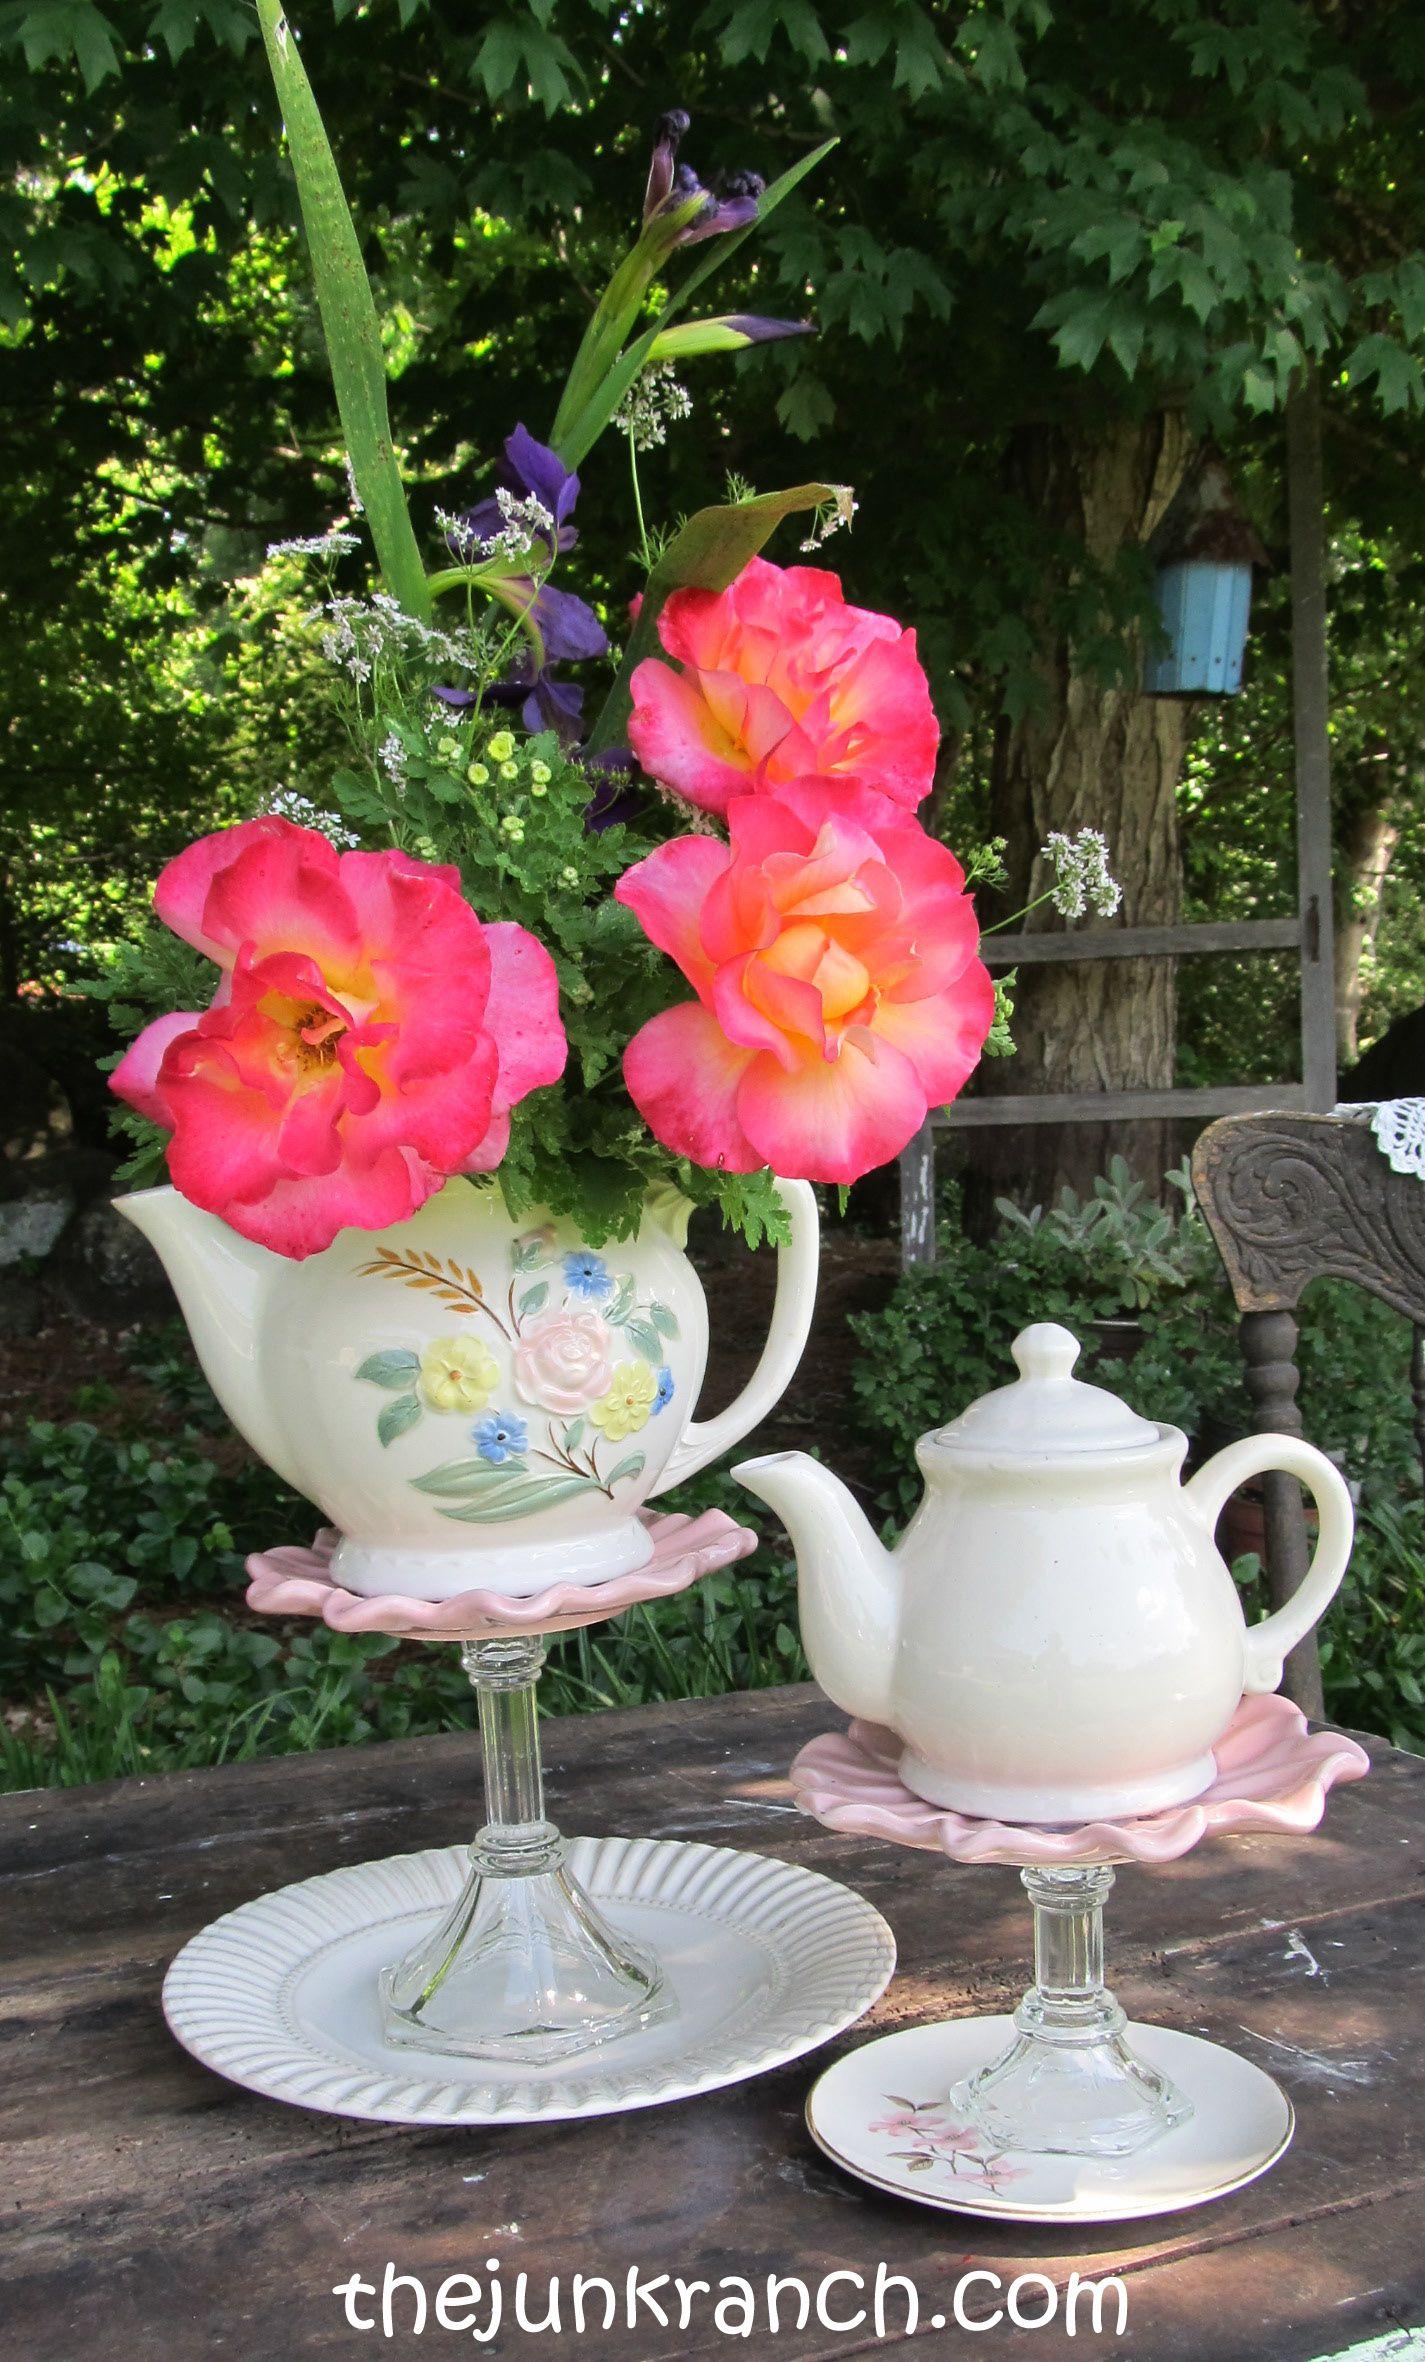 tea pot centerpieces with removable lids for flowers if you choose tea party tischdeko. Black Bedroom Furniture Sets. Home Design Ideas